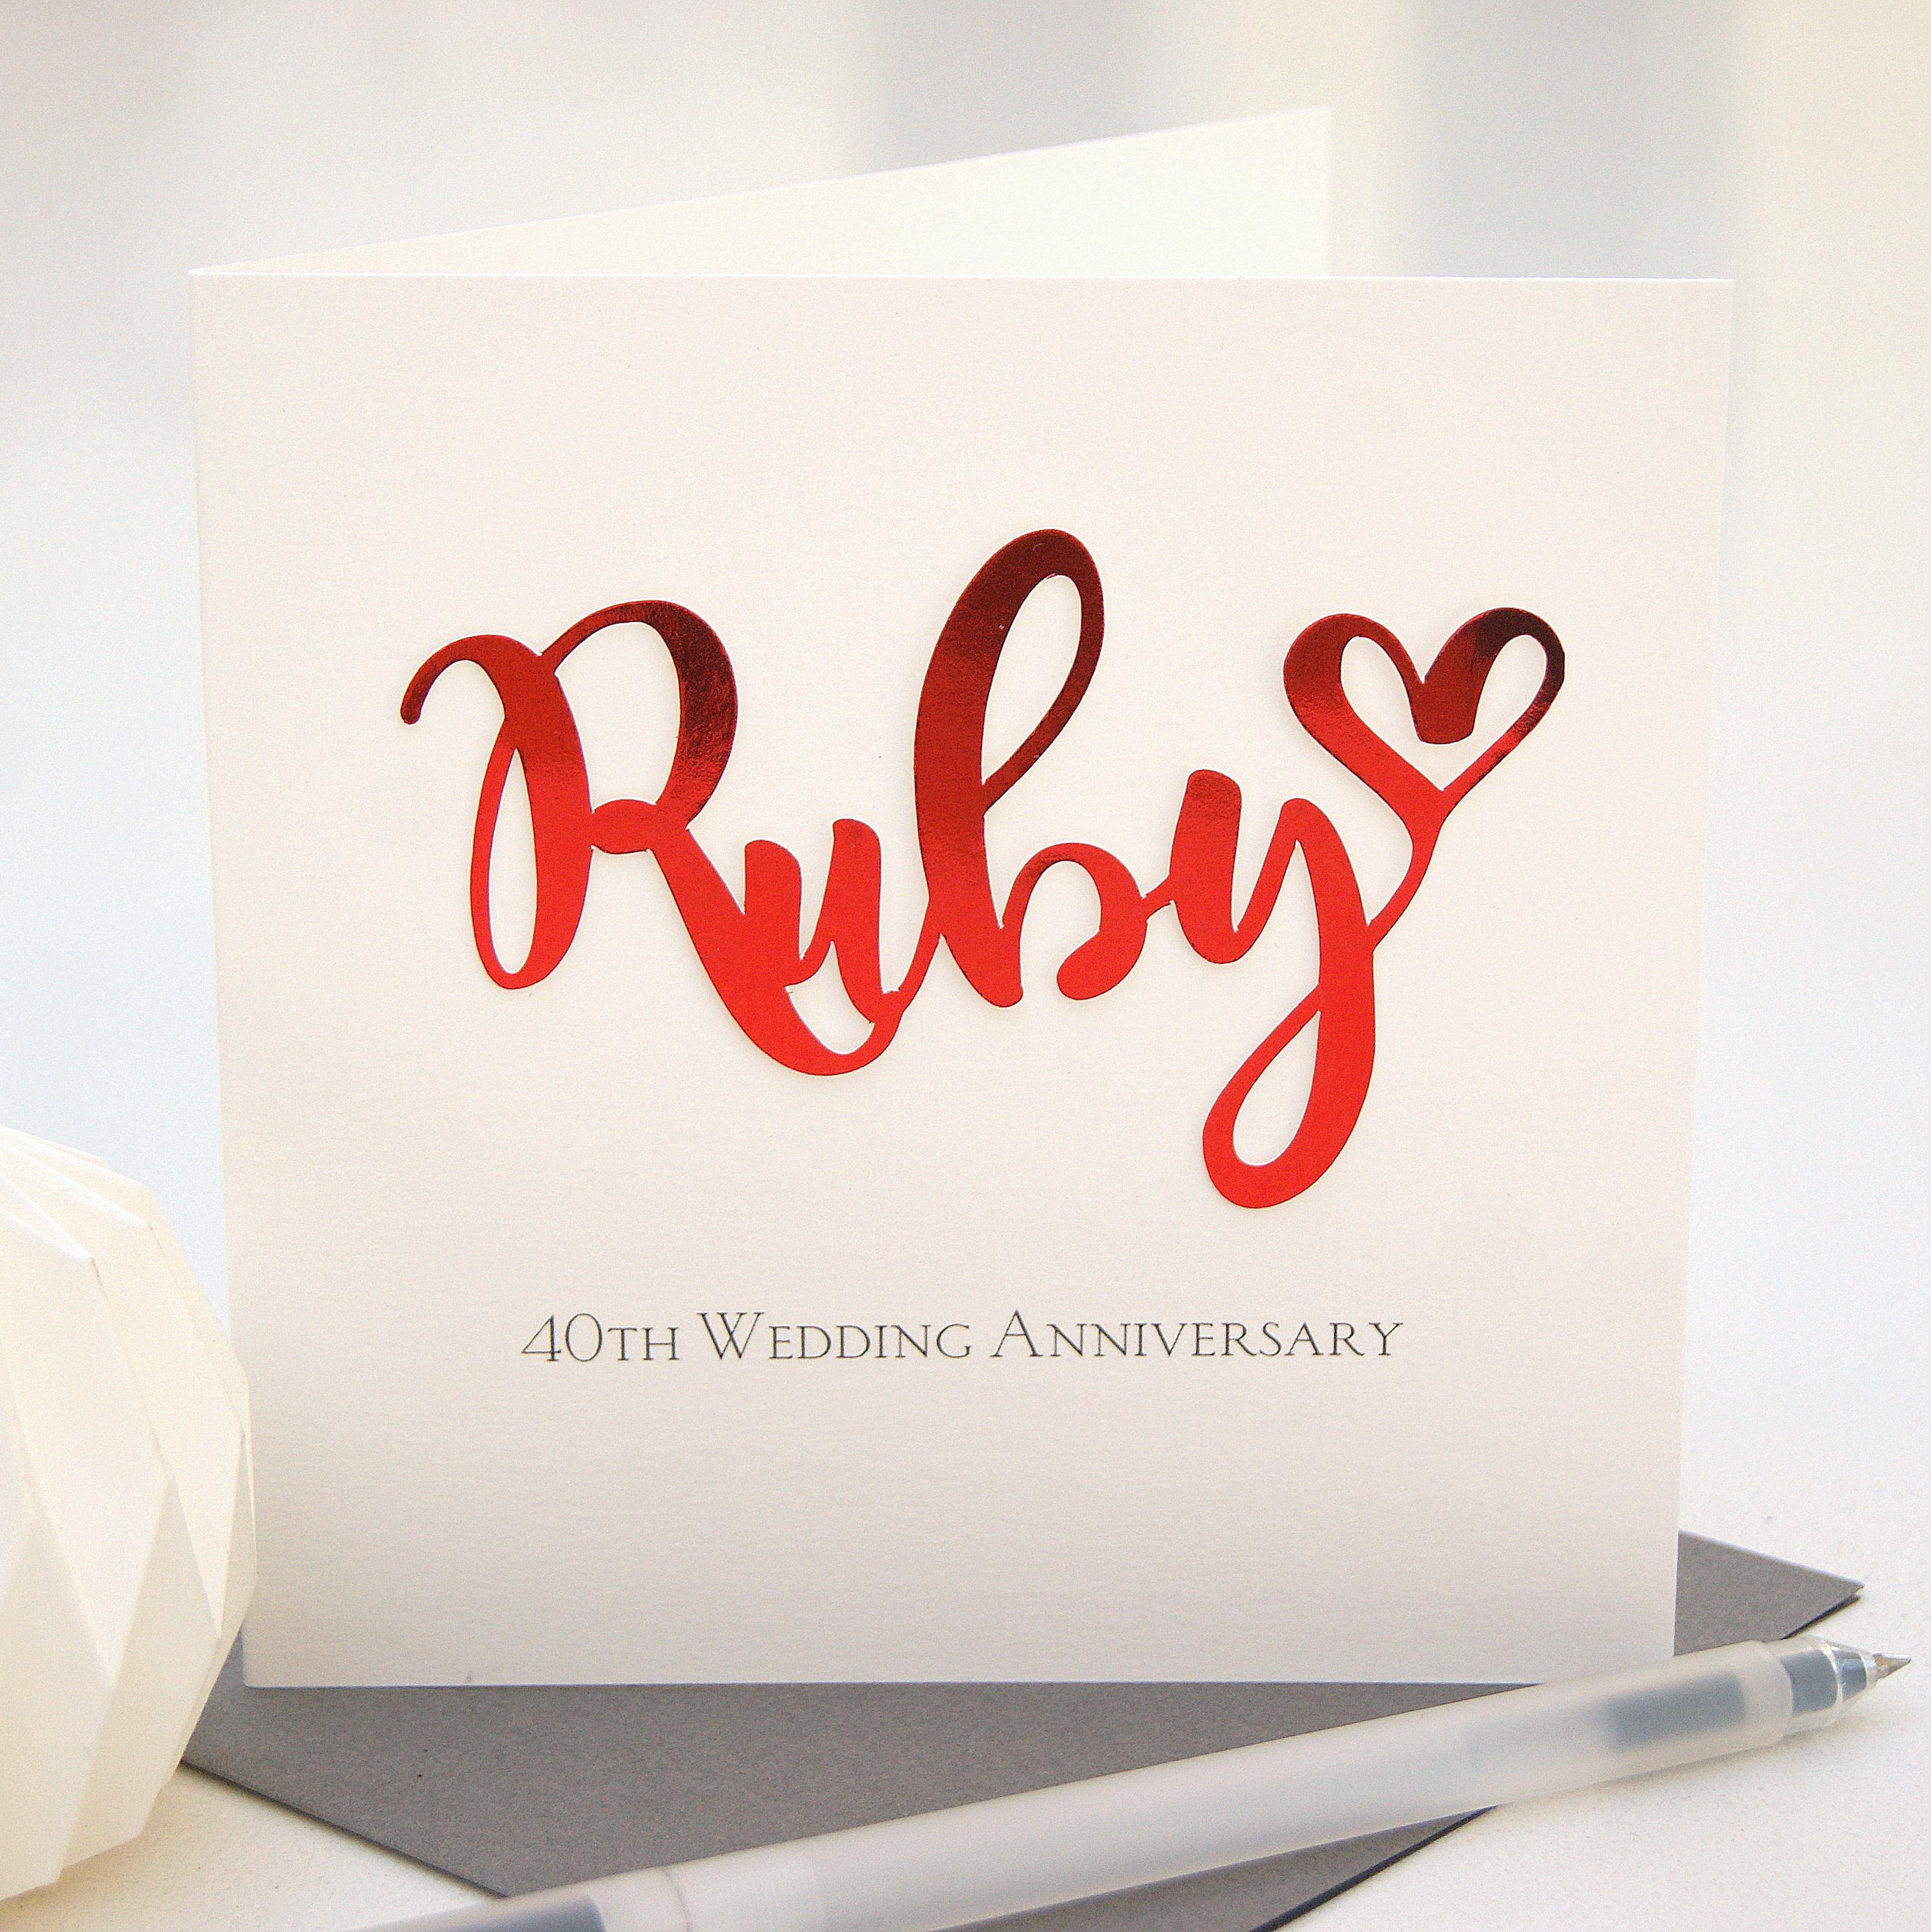 Ruby 40th Wedding Anniversary Card  Shop Online  Hummingbird Card Company